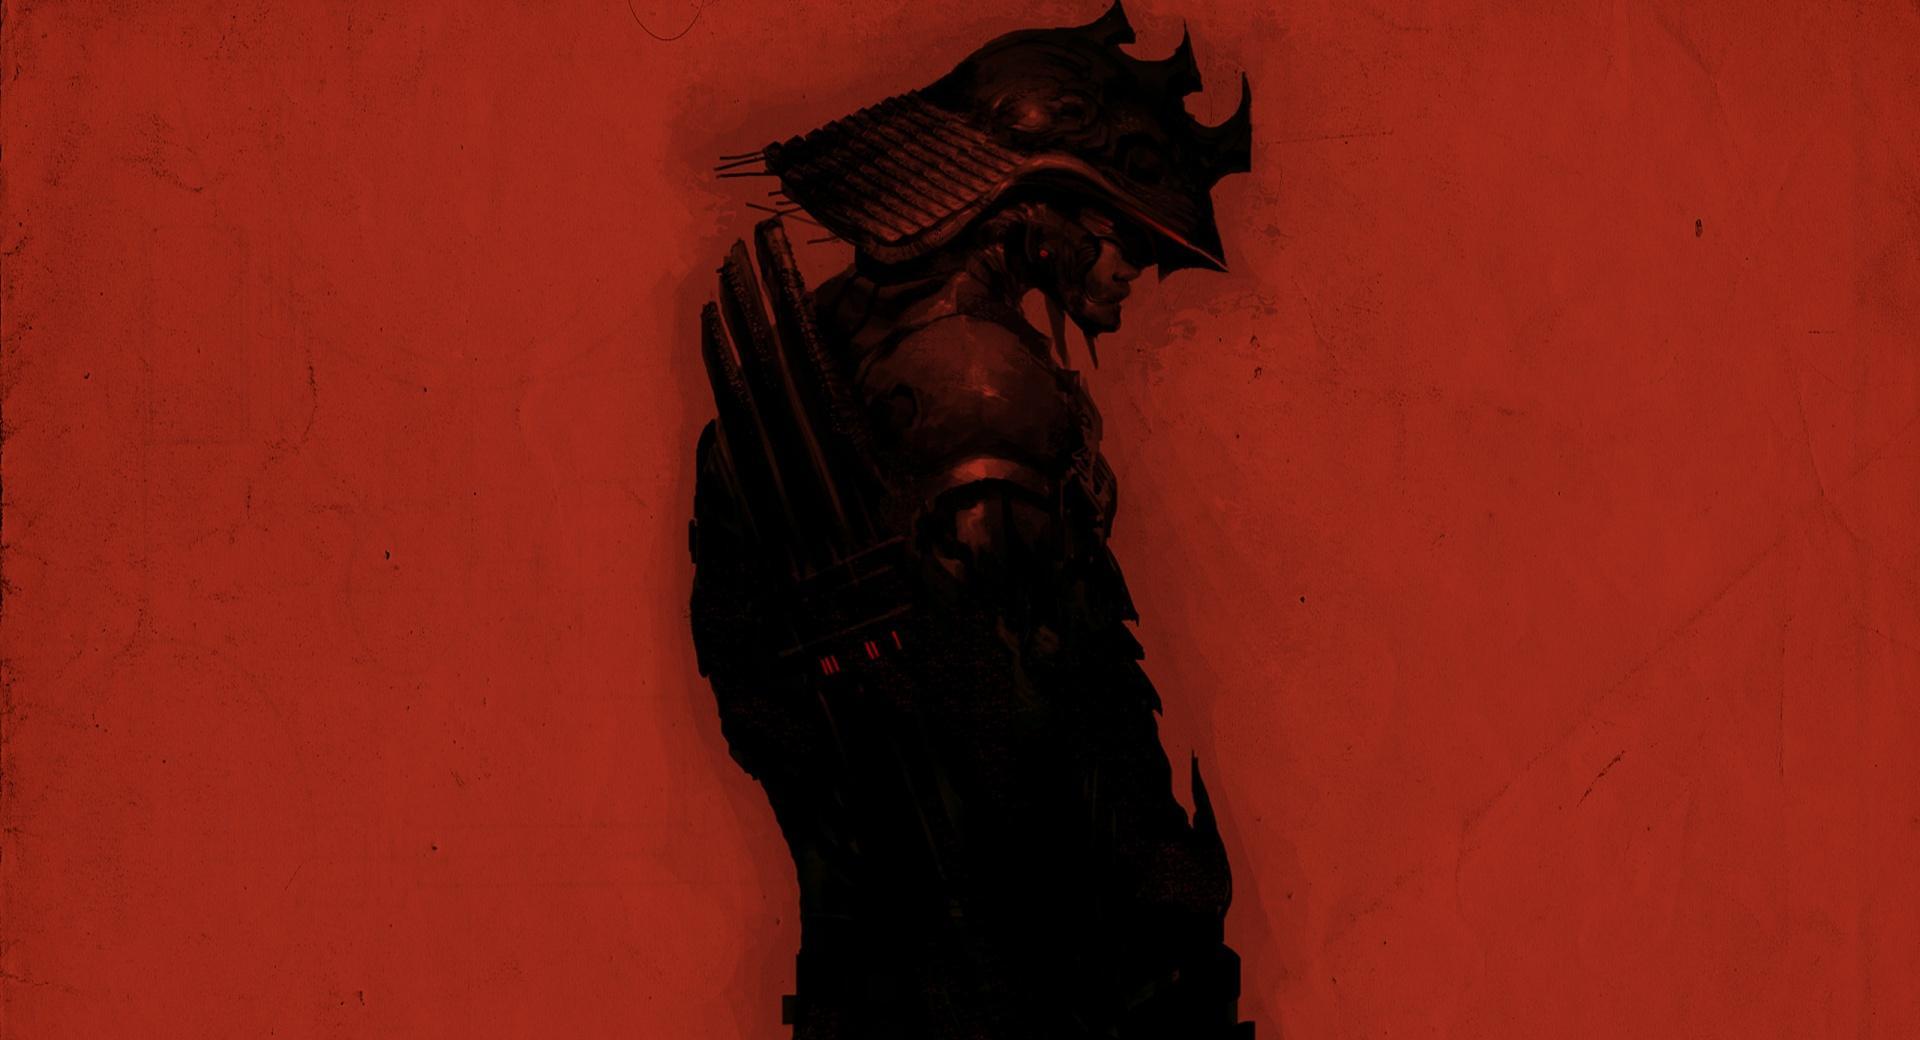 Samurai Art wallpapers HD quality